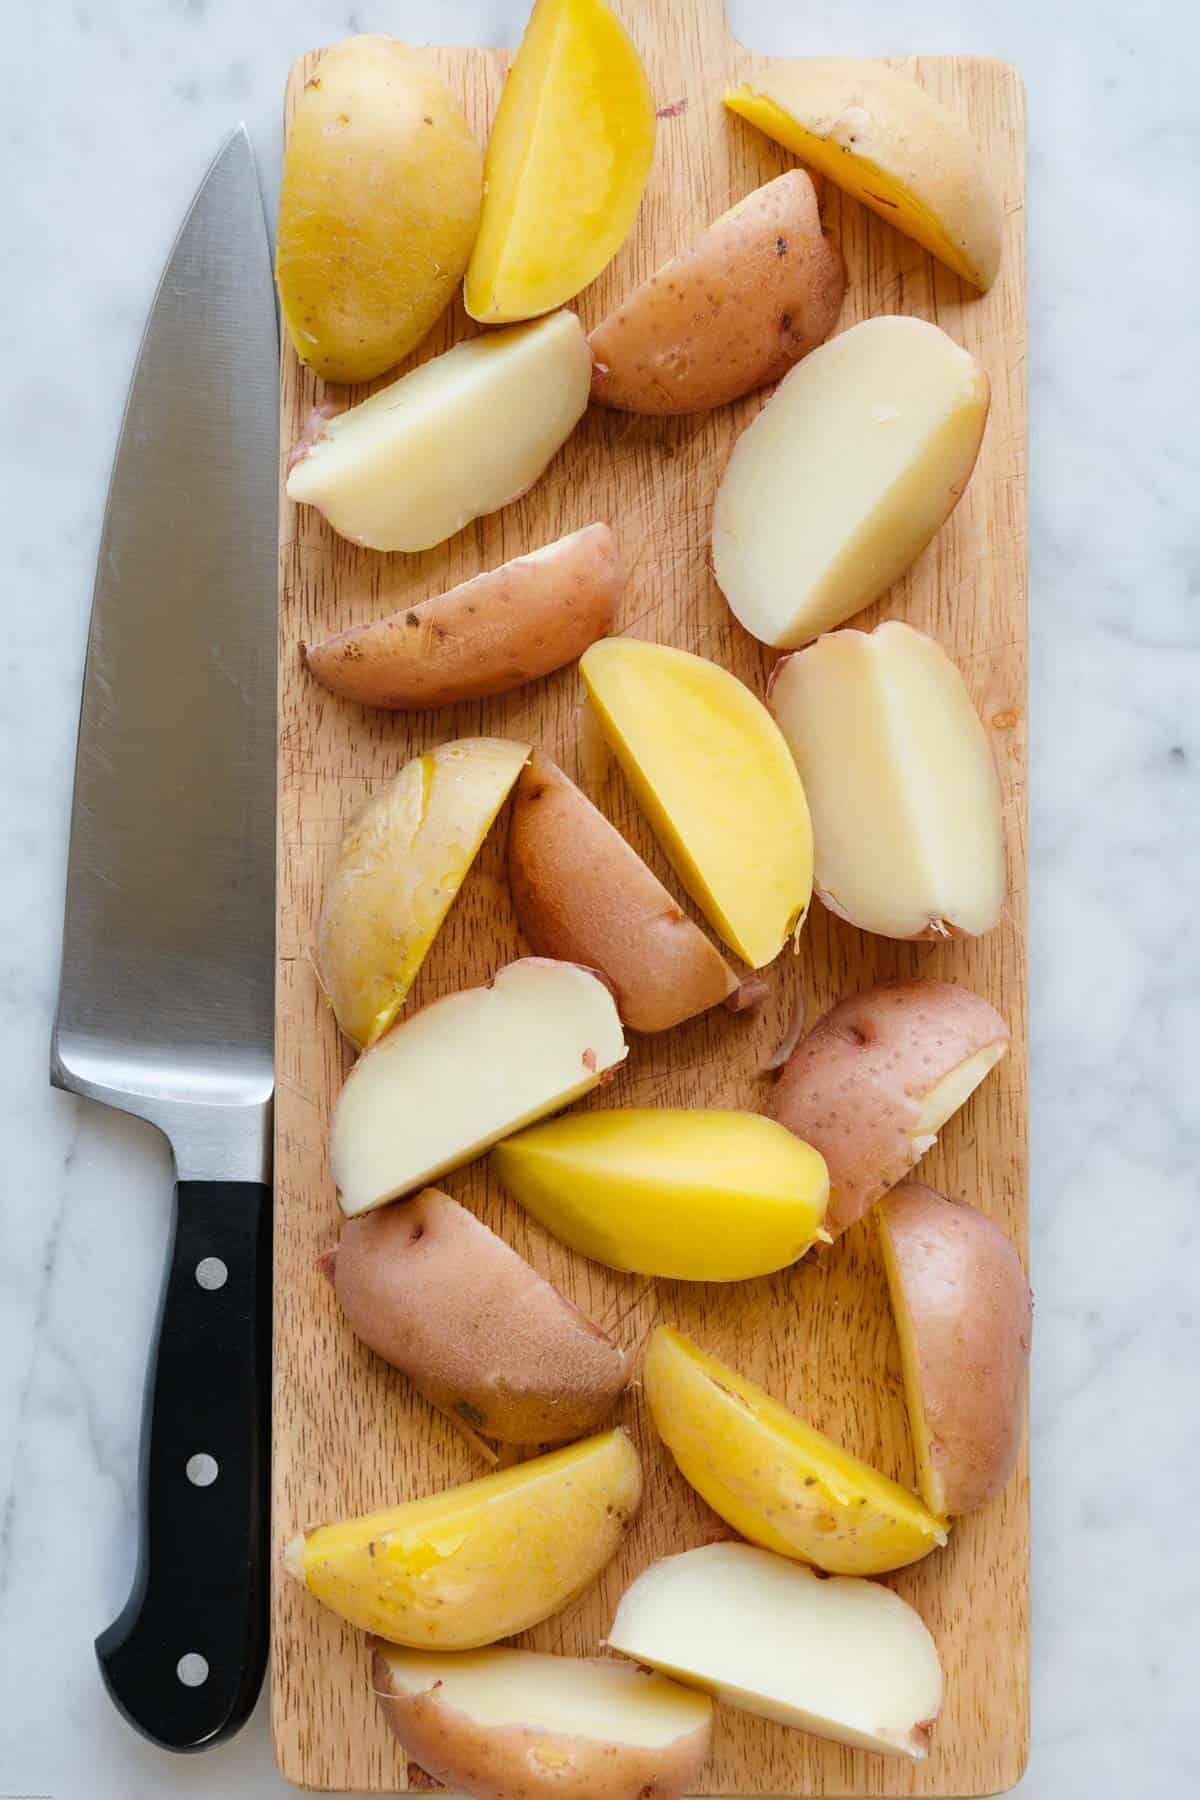 Sliced Yukon Gold potatoes on a cutting board.